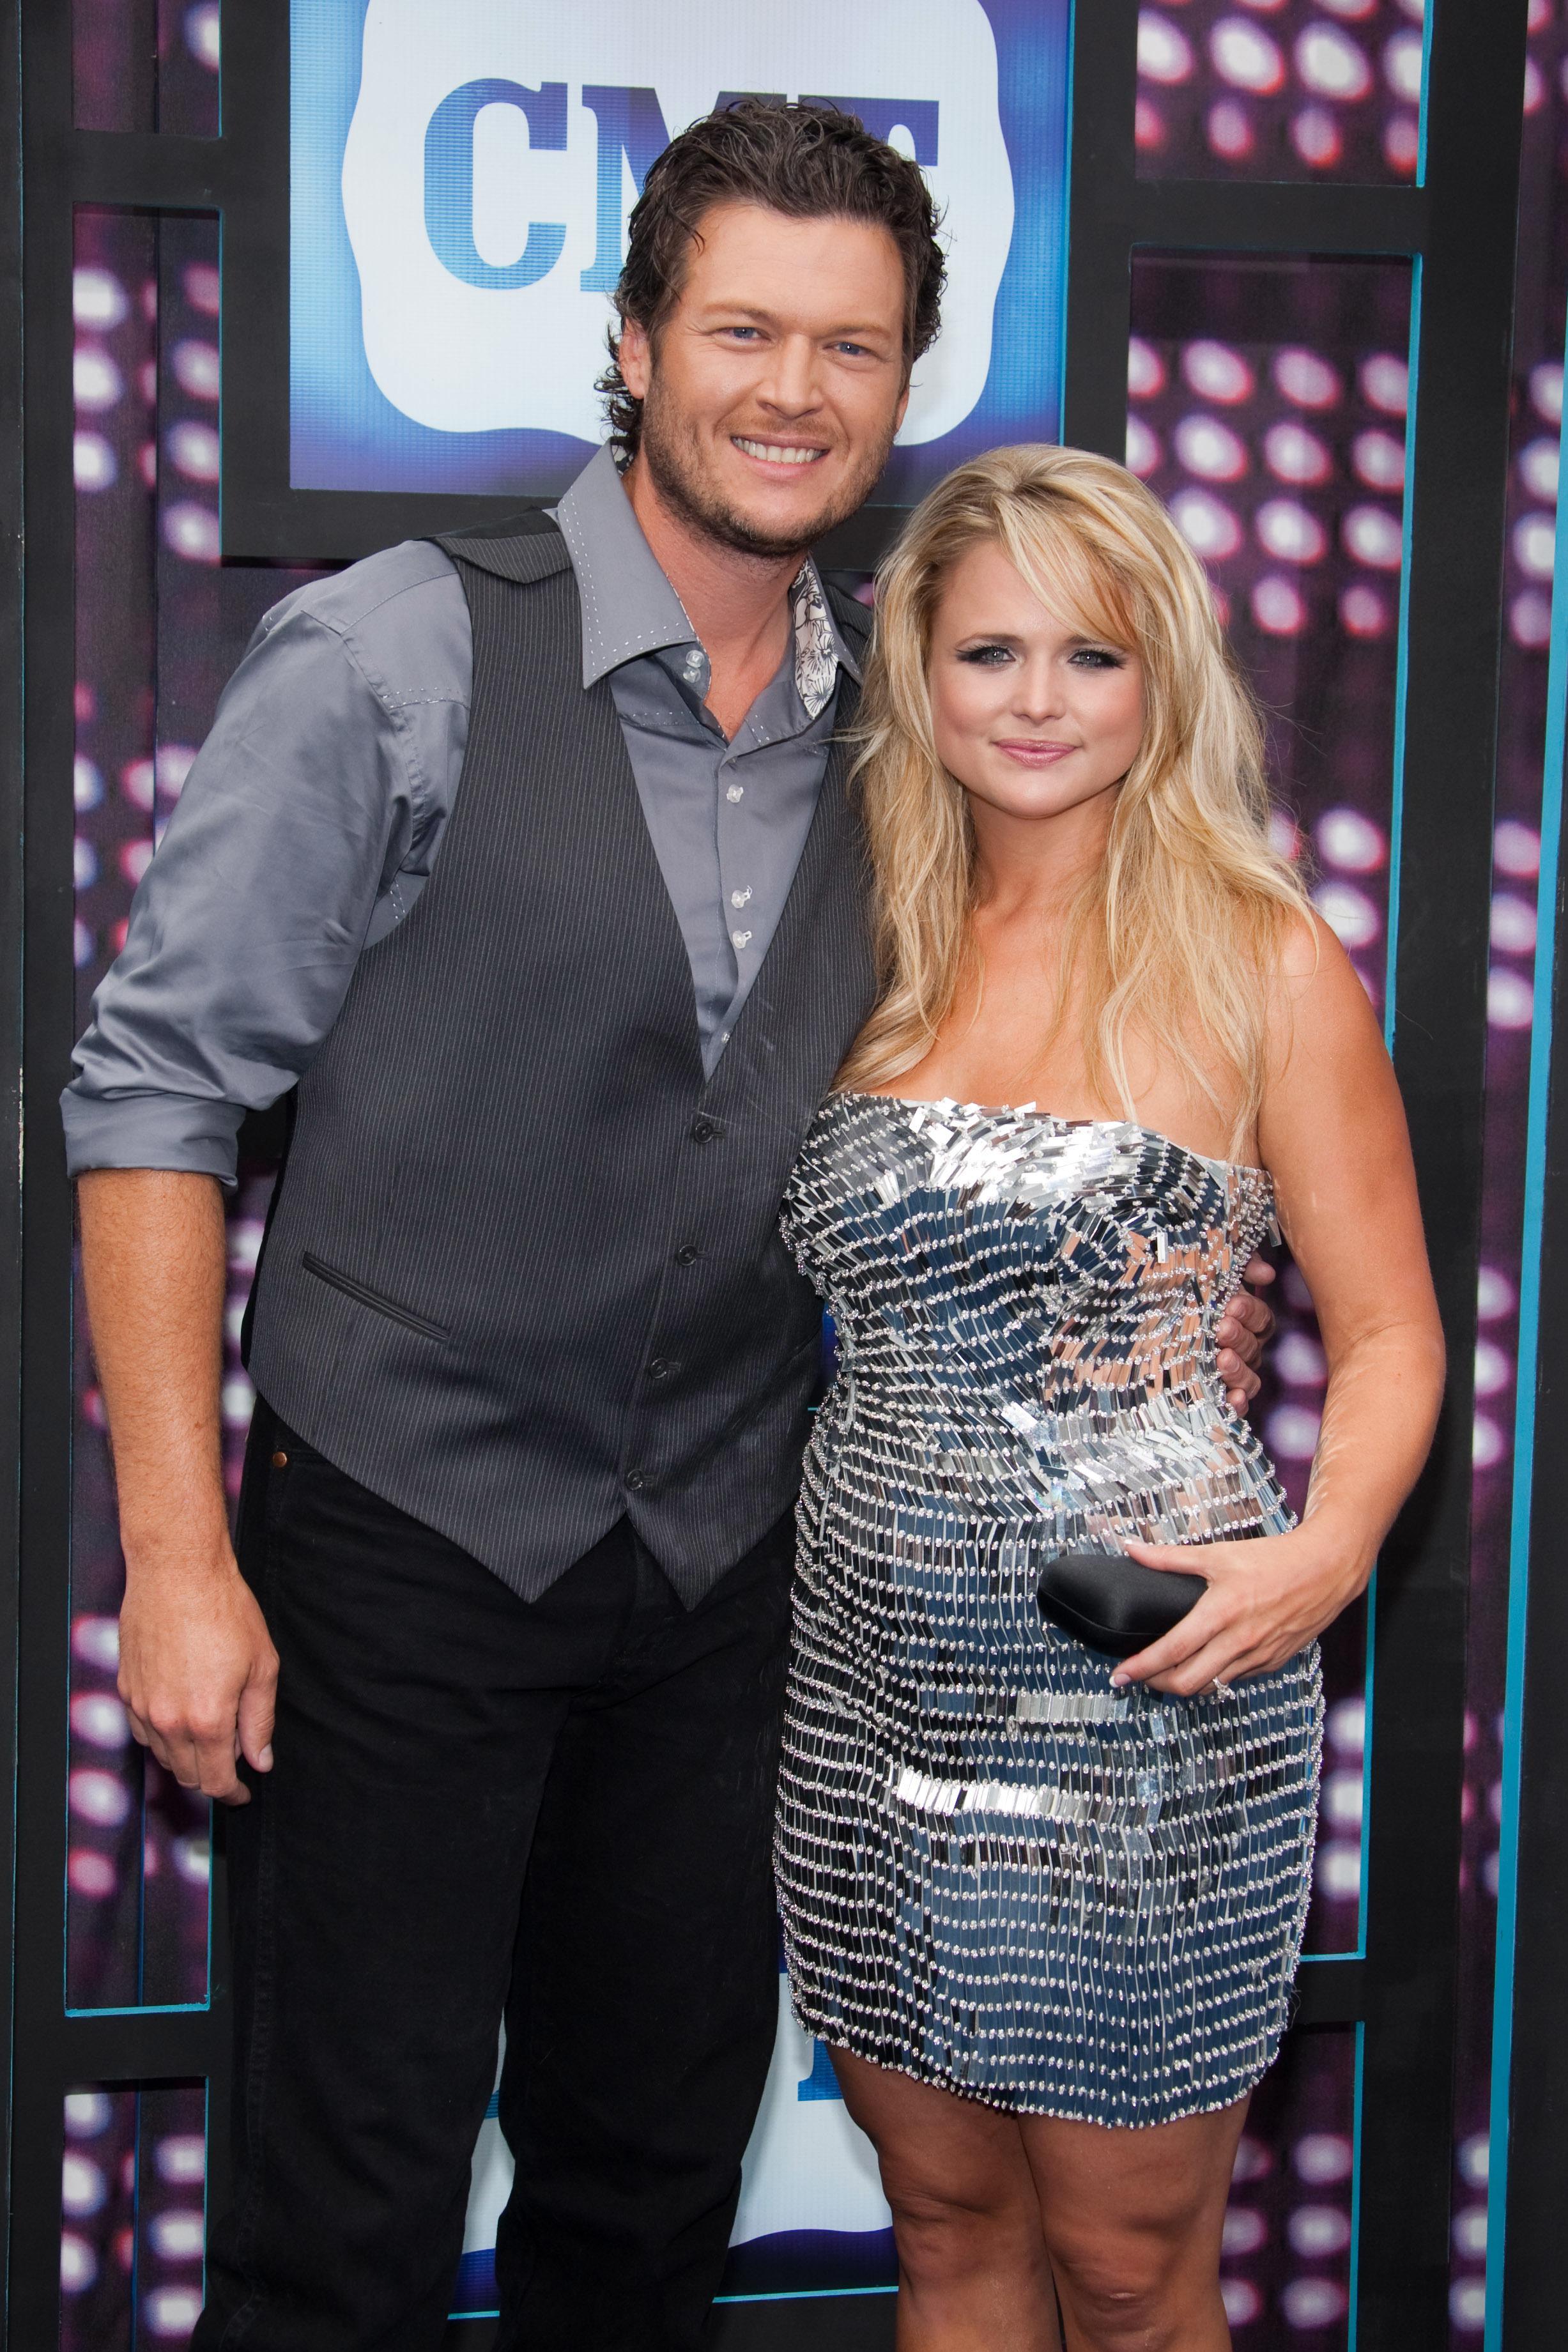 Blake Shelton and Miranda Lambert attend the CMT Music Awards in Nashville, Tennessee, on June 9, 2010.